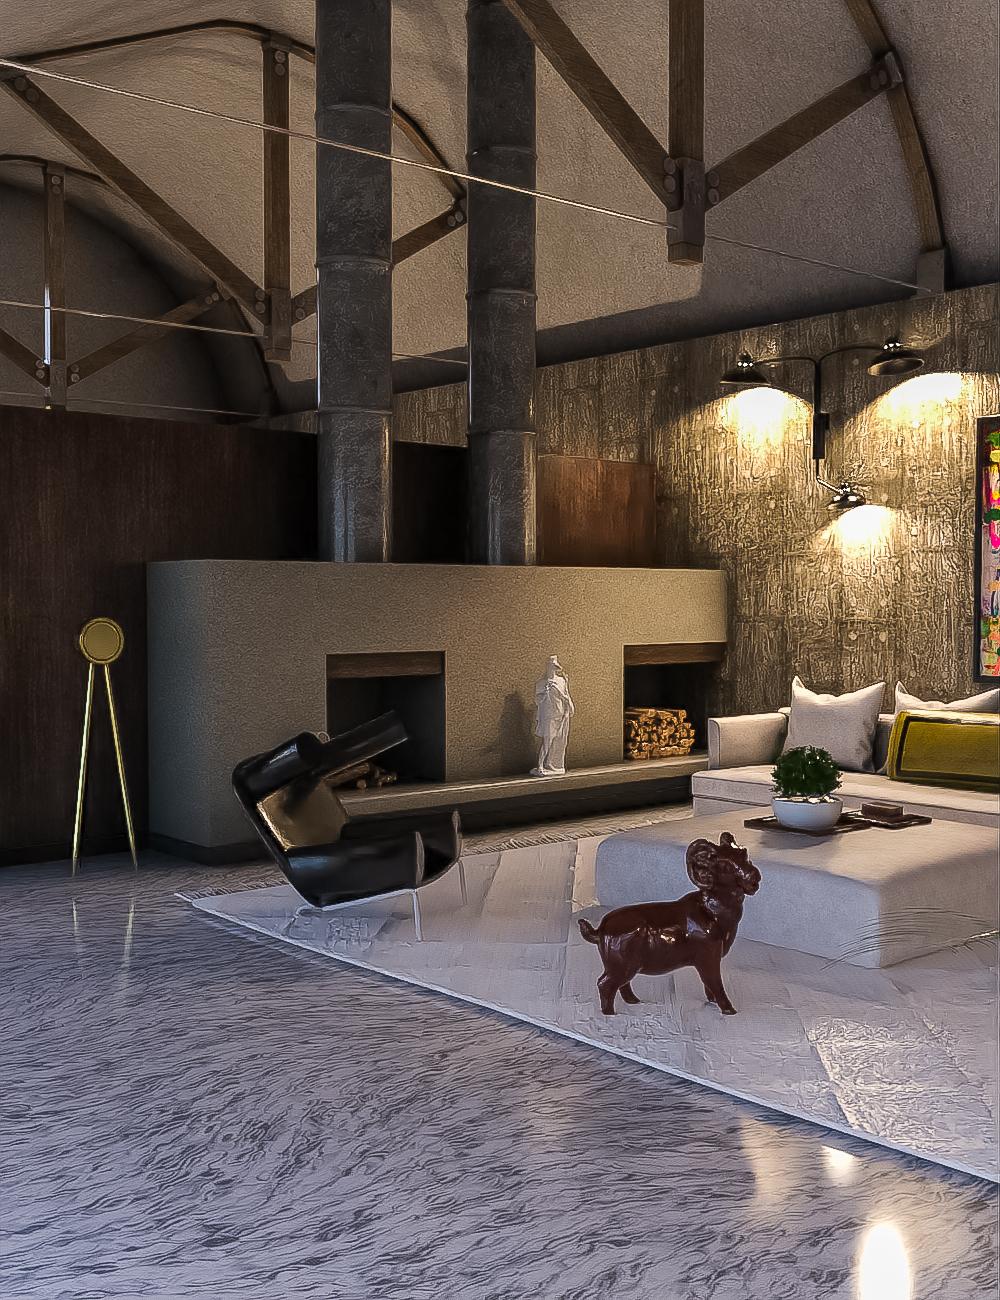 Lakehouse Lounge by: clacydarch3d, 3D Models by Daz 3D